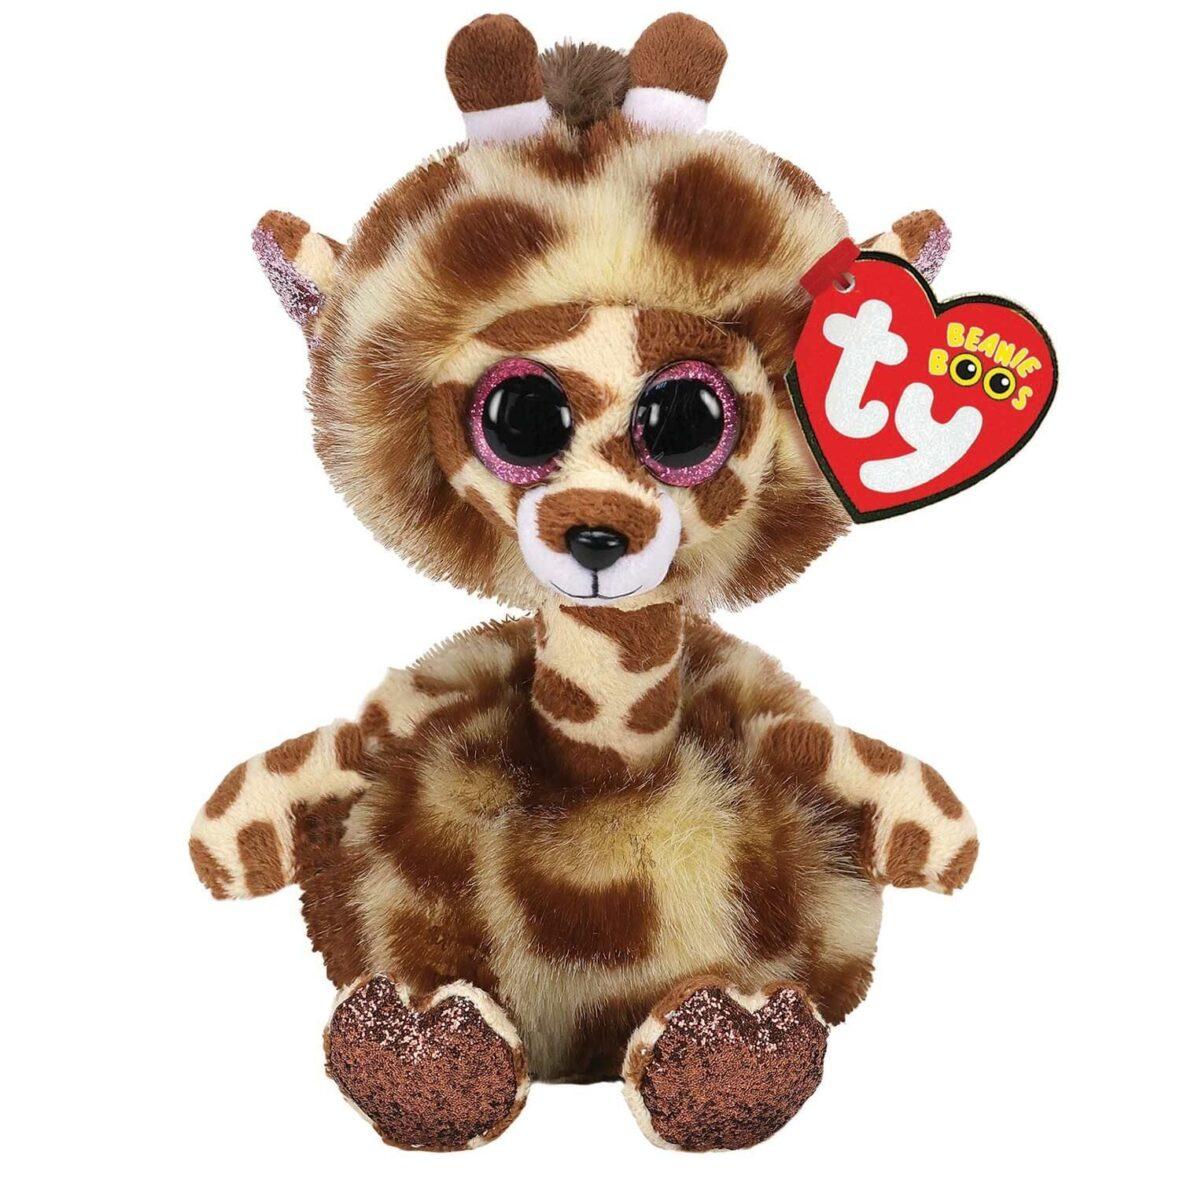 Plus Ty 15cm Girafa Cu Gat Lung